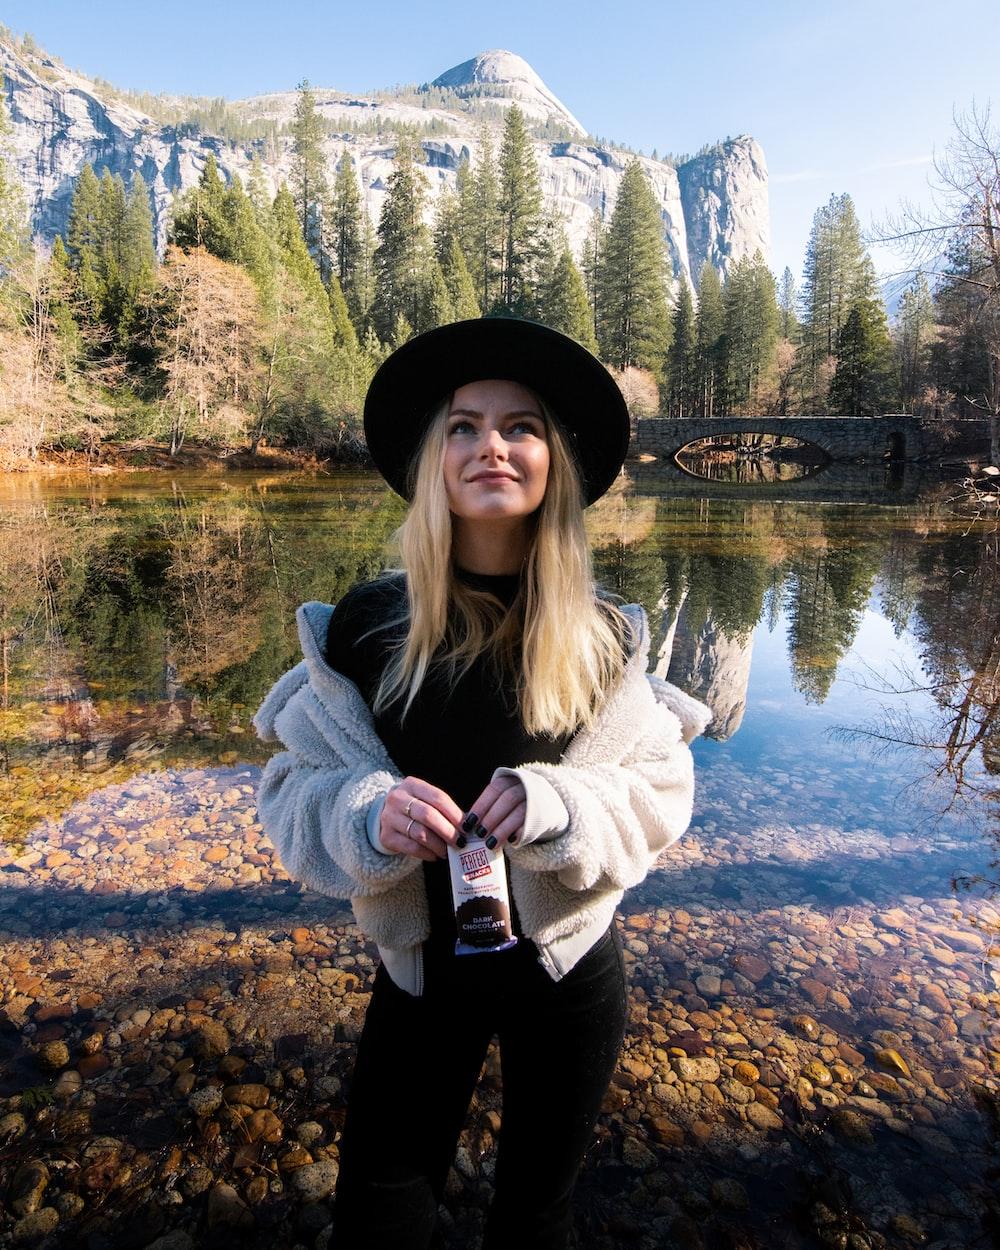 woman in gray jacket standing near lake during daytime